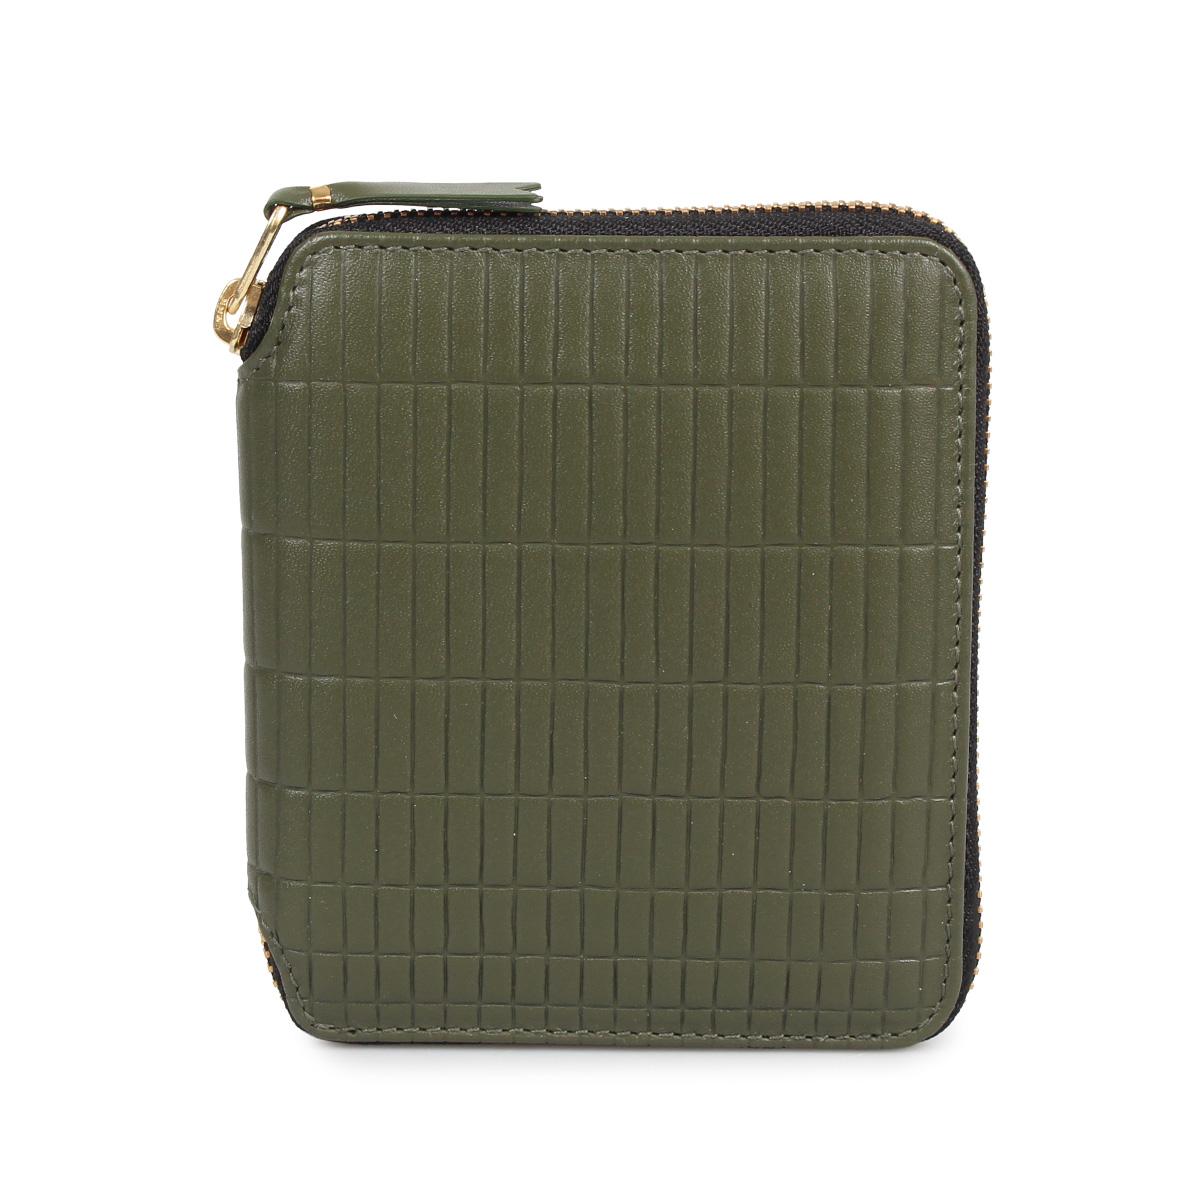 COMME des GARCONS BRICK WALLET コムデギャルソン 財布 二つ折り メンズ レディース カーキ SA2100BK